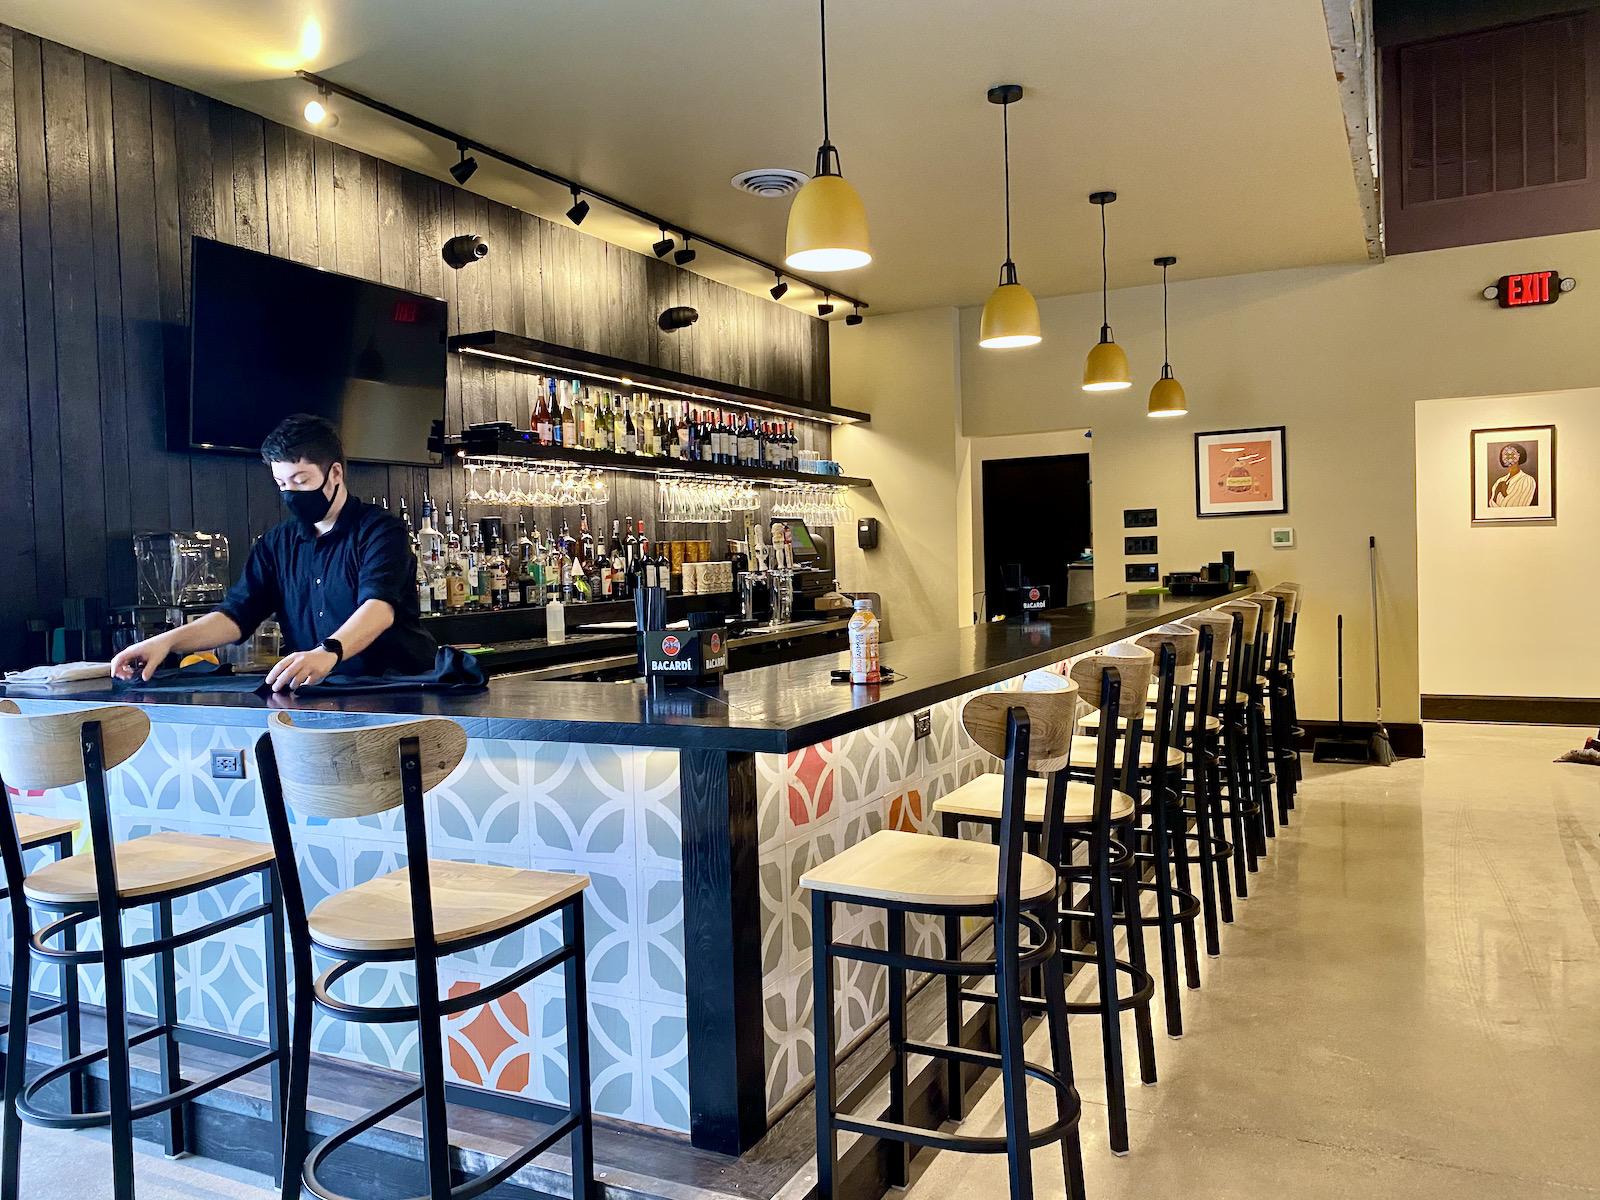 Bar at Noche restaurant